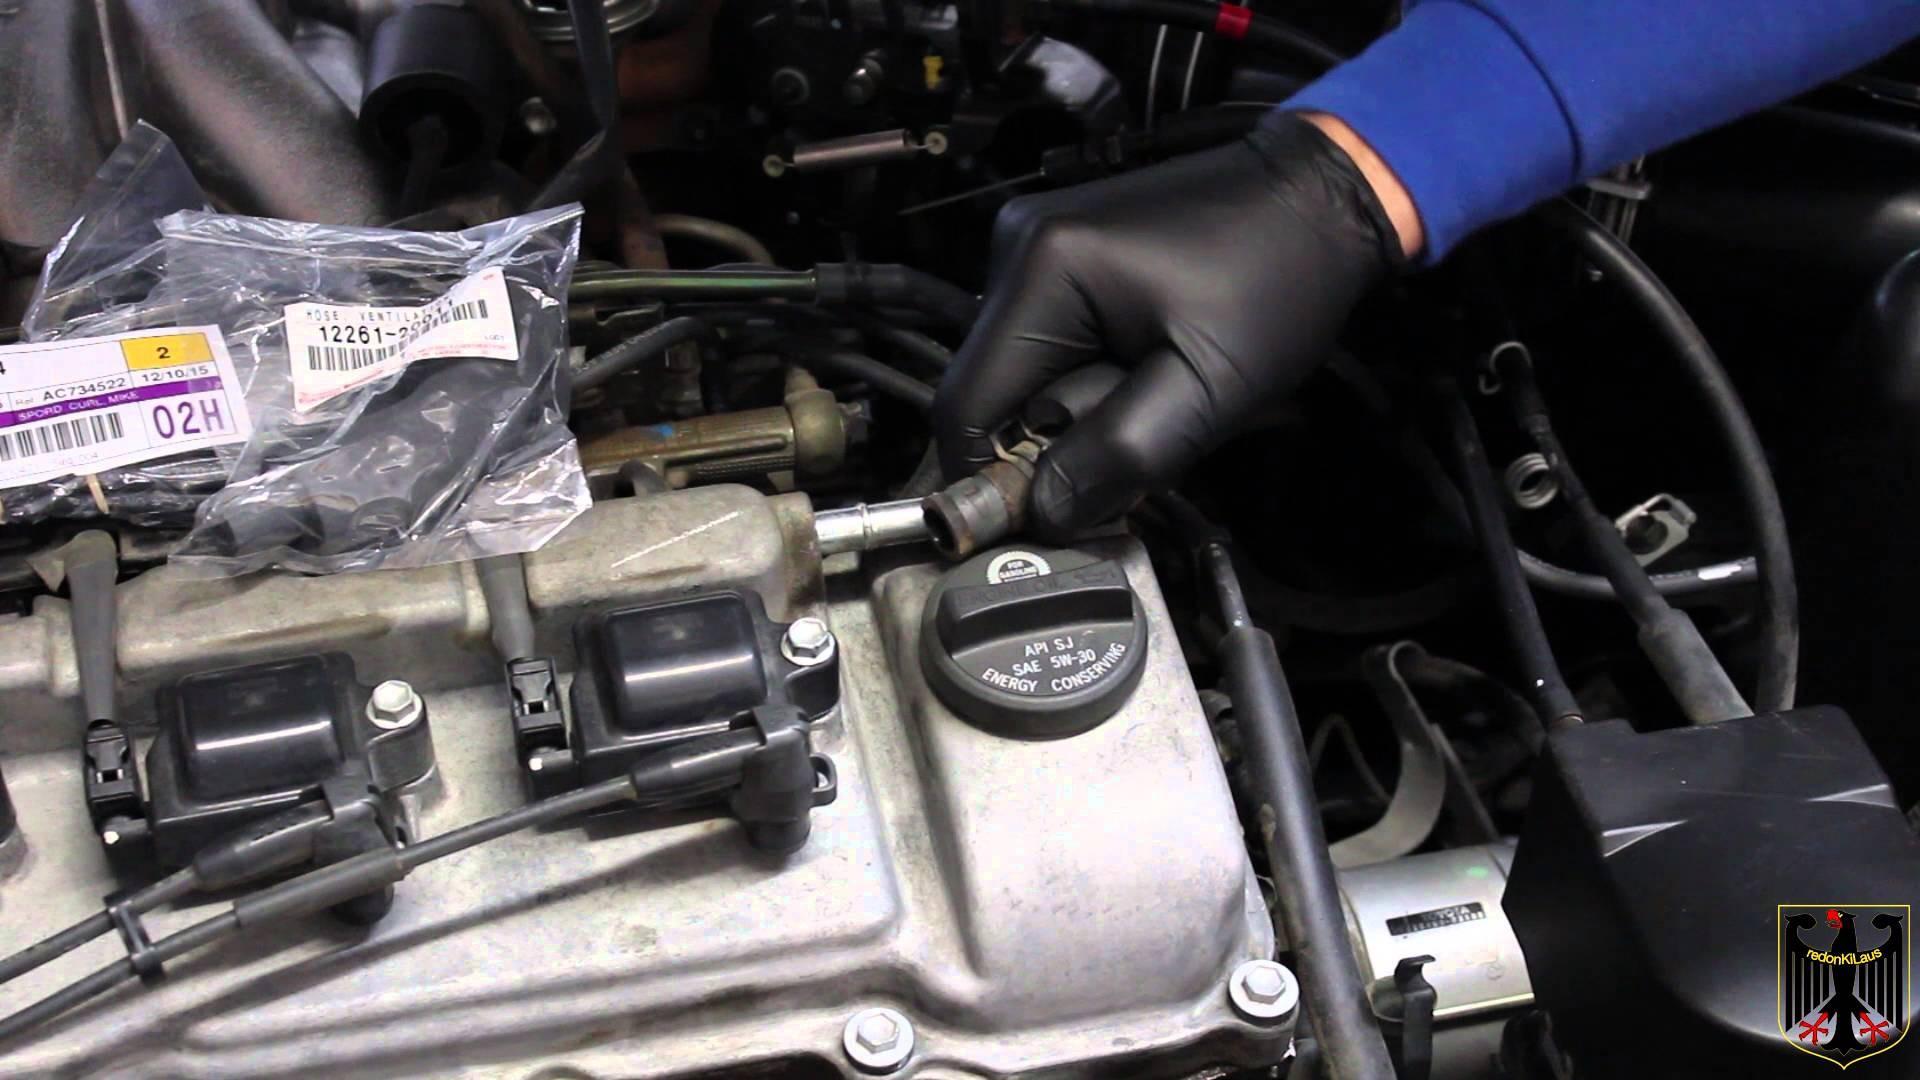 2002 toyota Camry 4 Cylinder Engine Diagram 2001 toyota Camry Vacuum Line Replacement Of 2002 toyota Camry 4 Cylinder Engine Diagram